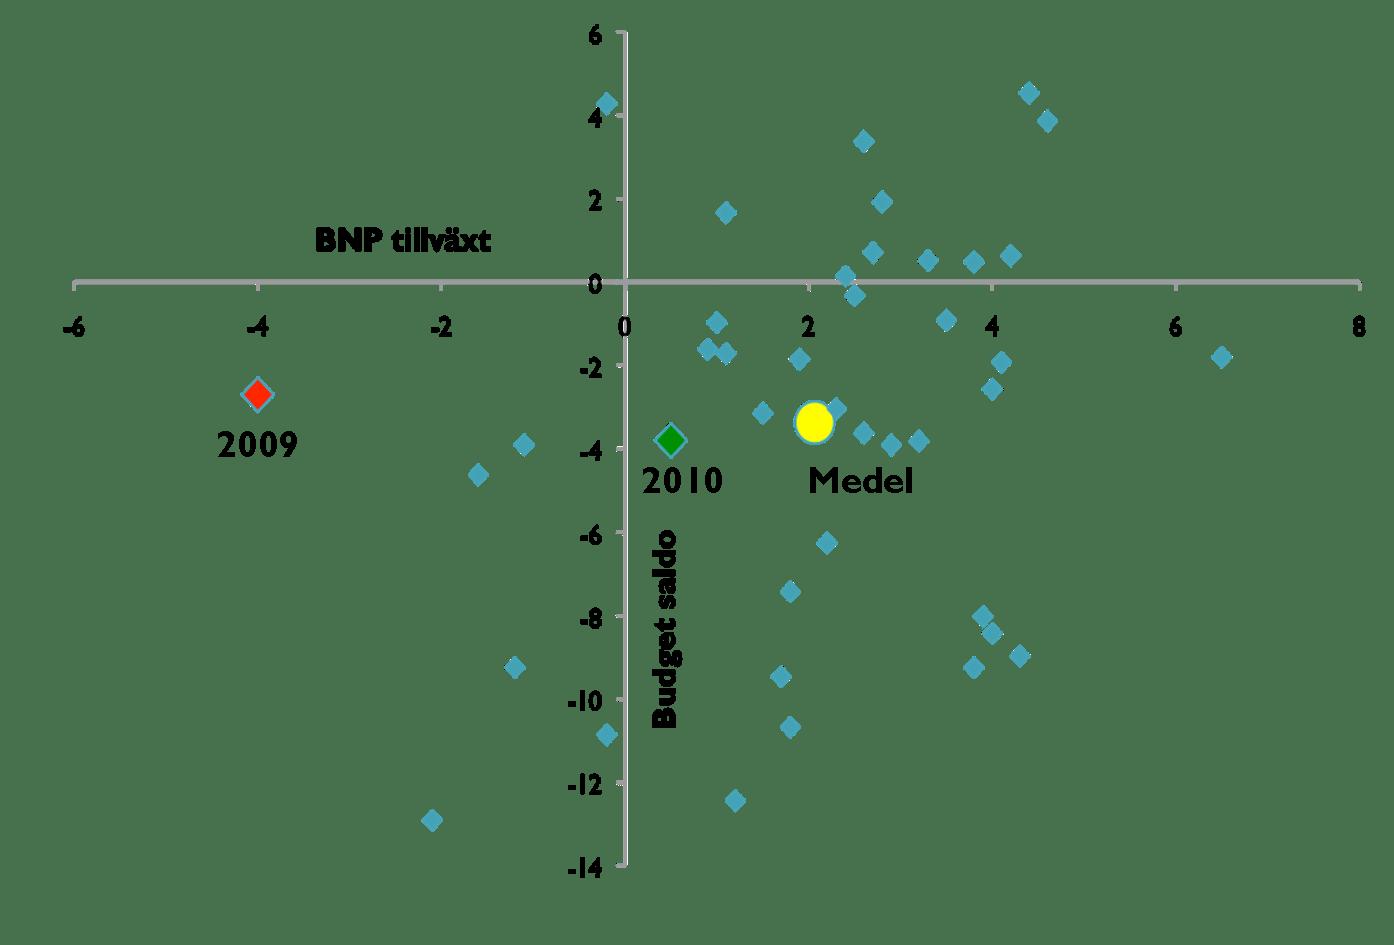 Budgetsaldo/BNP och BNP tillväxt 1970-2010